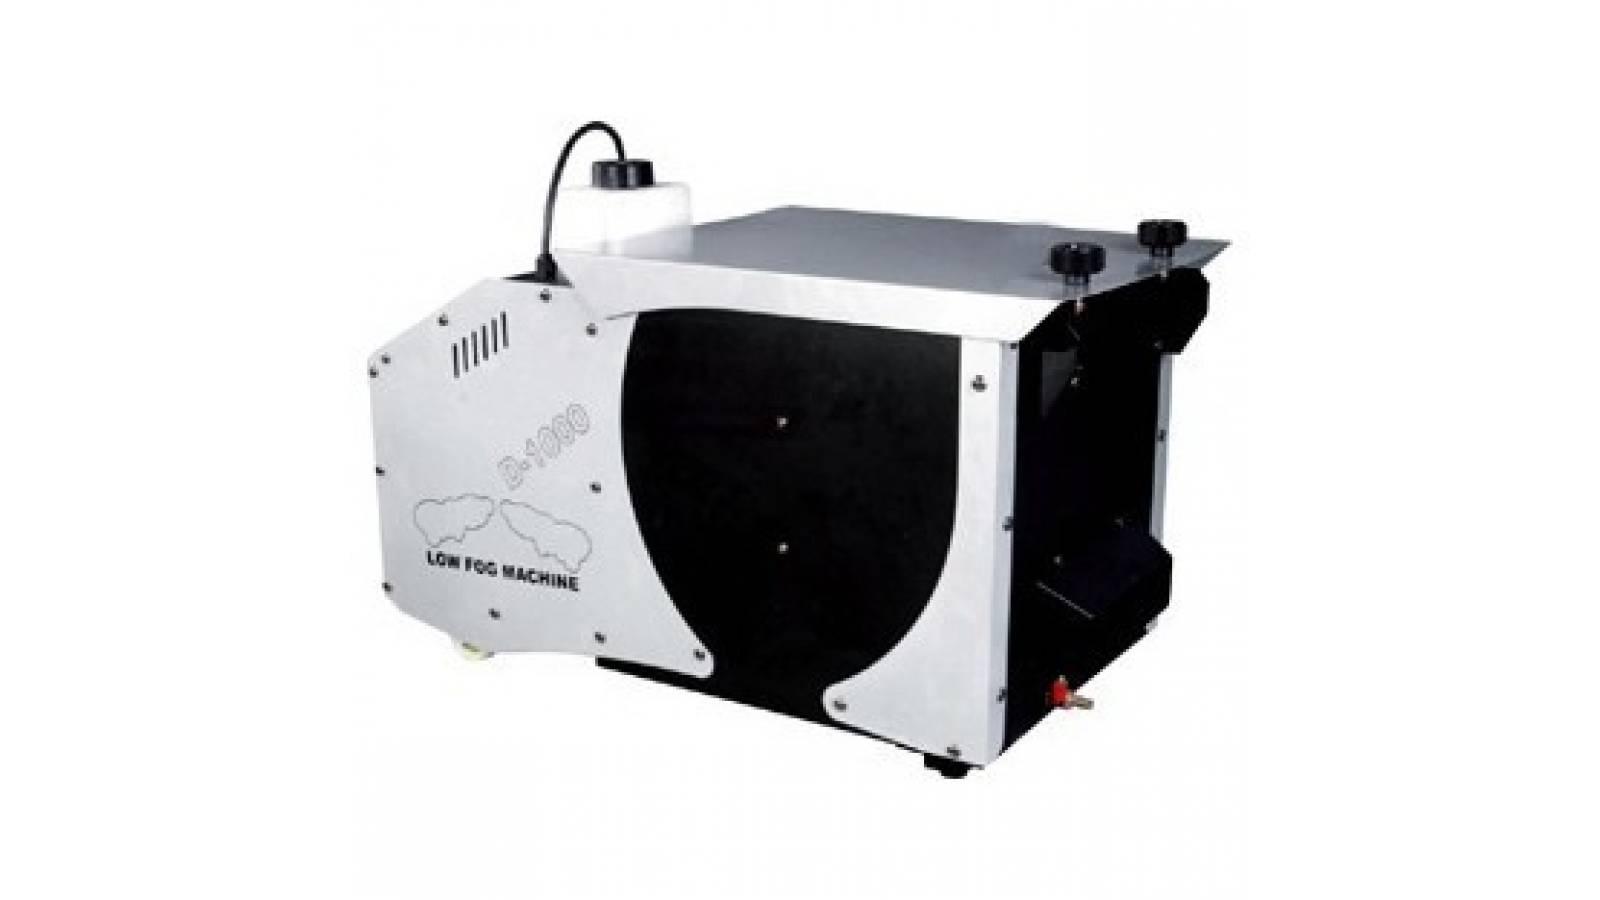 Low Fog Machine Maquina Humo Bajo Control Inalambrico GcmPro